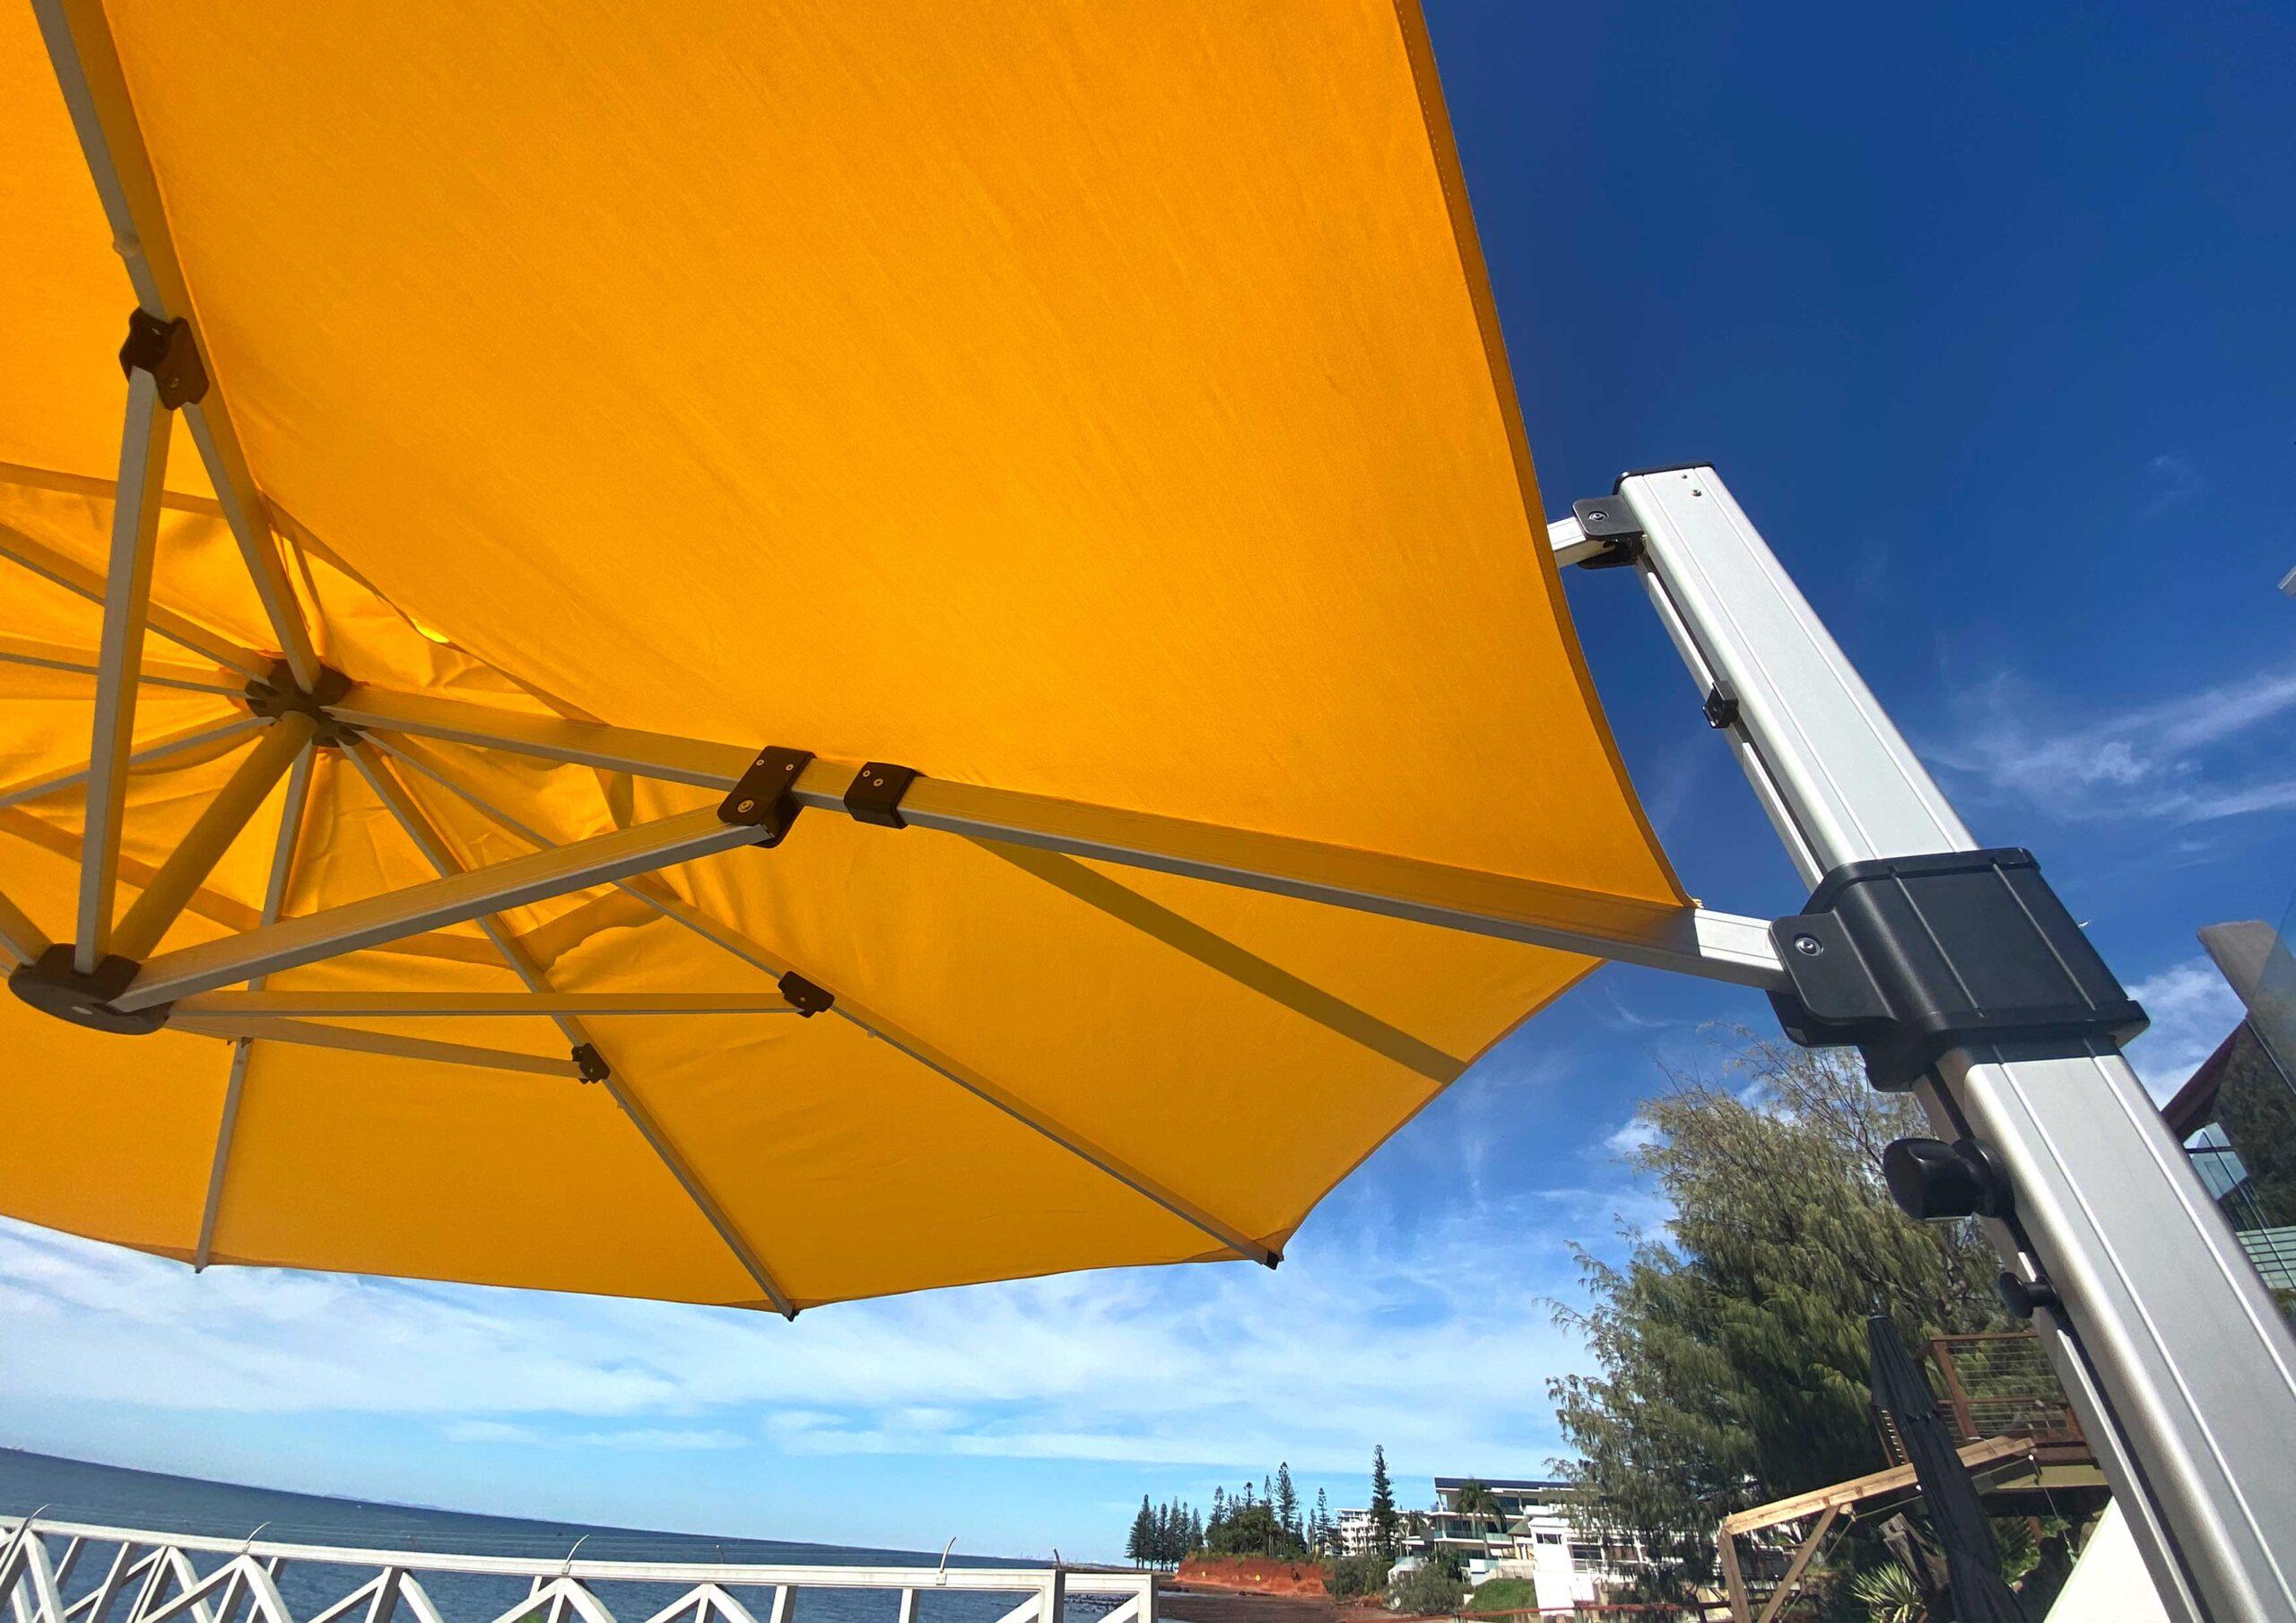 fs gallery images cantilever round octogon umbrella 3